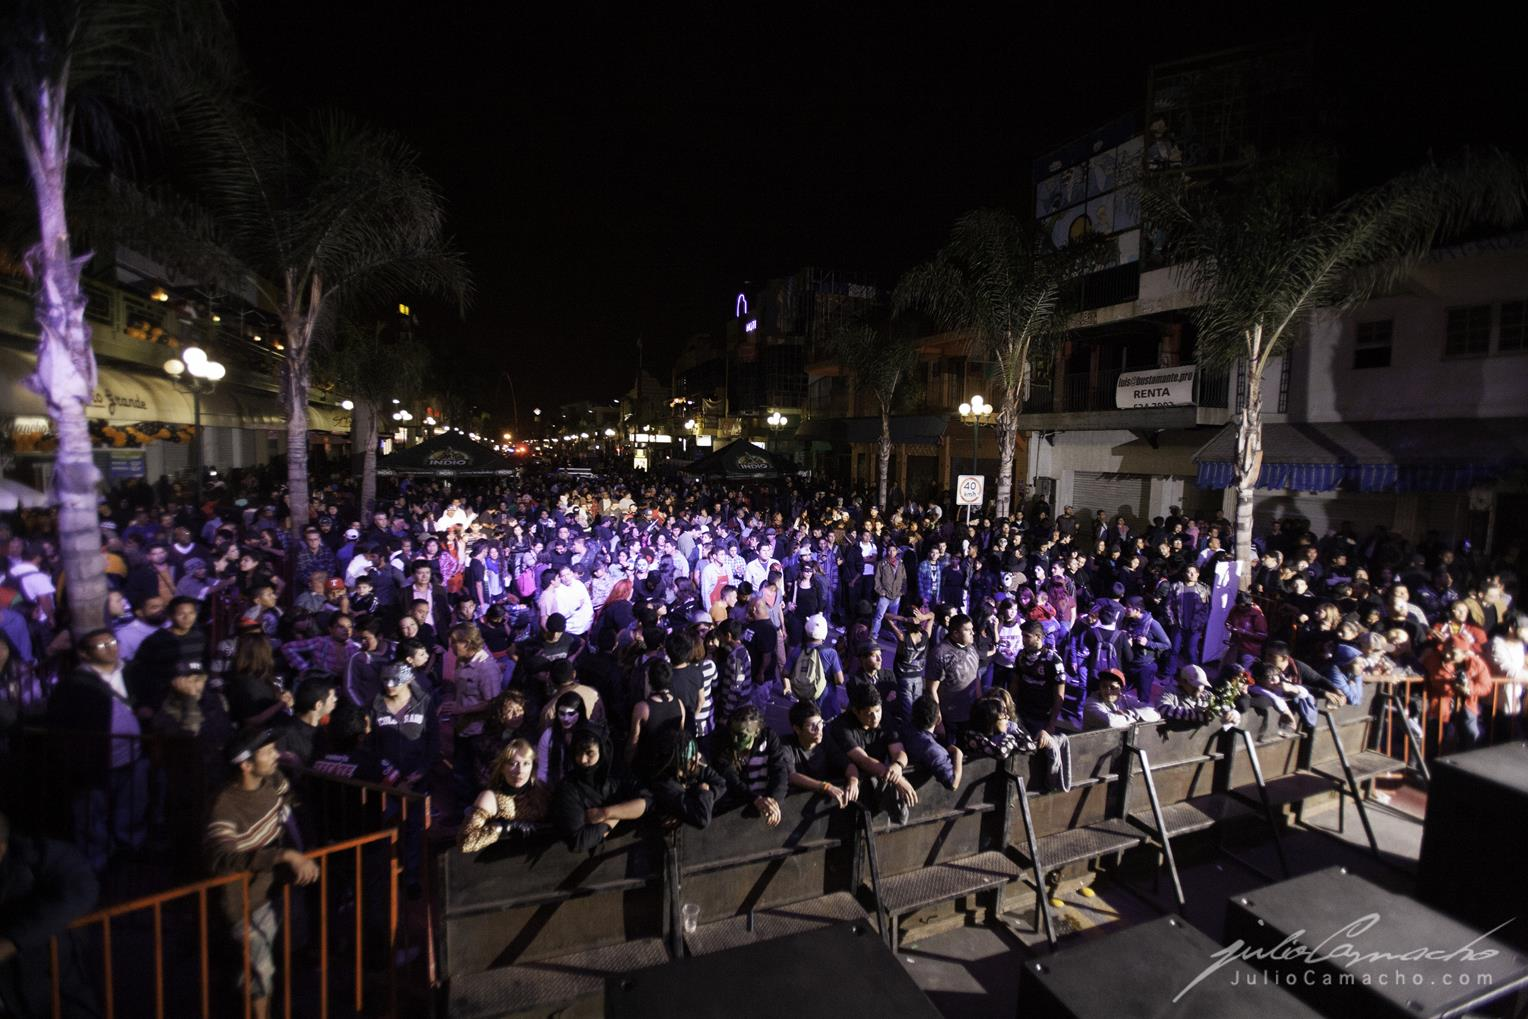 2014-10-30 31 CAST TOUR Ensenada y Tijuana - 1355 - www.Juli (Copy).jpg